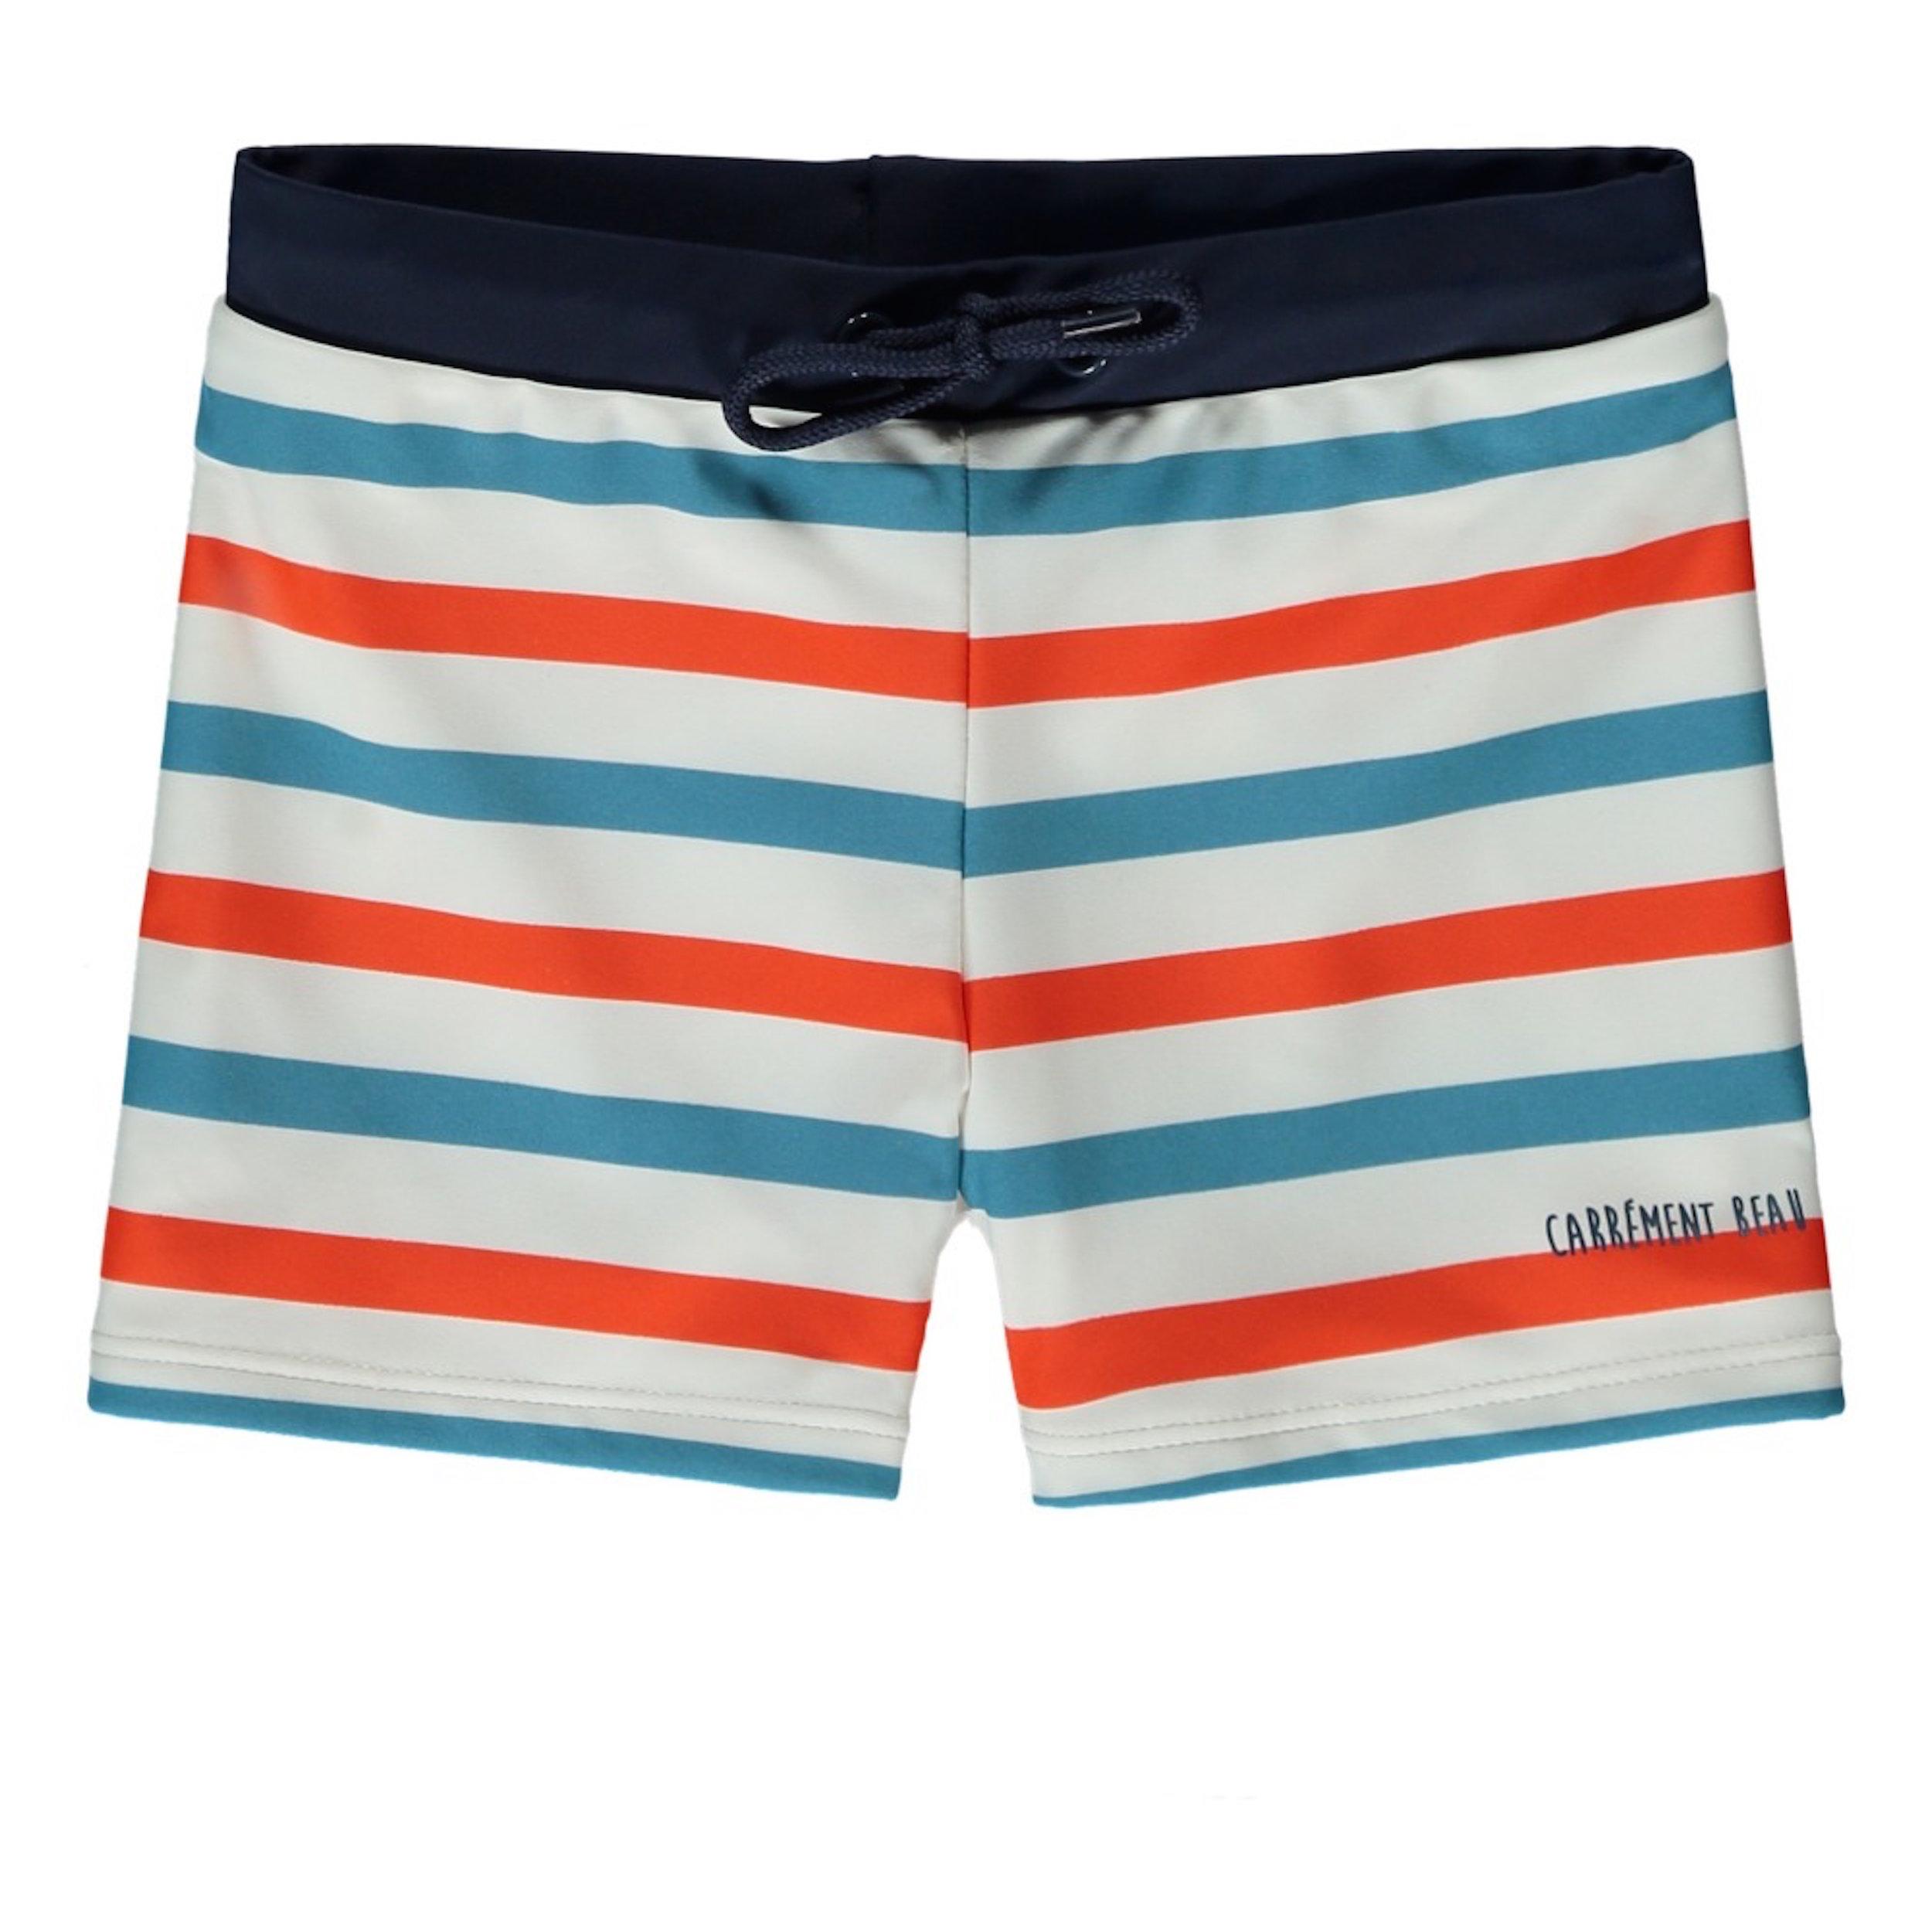 CArrement beau-swim-shorts.jpg